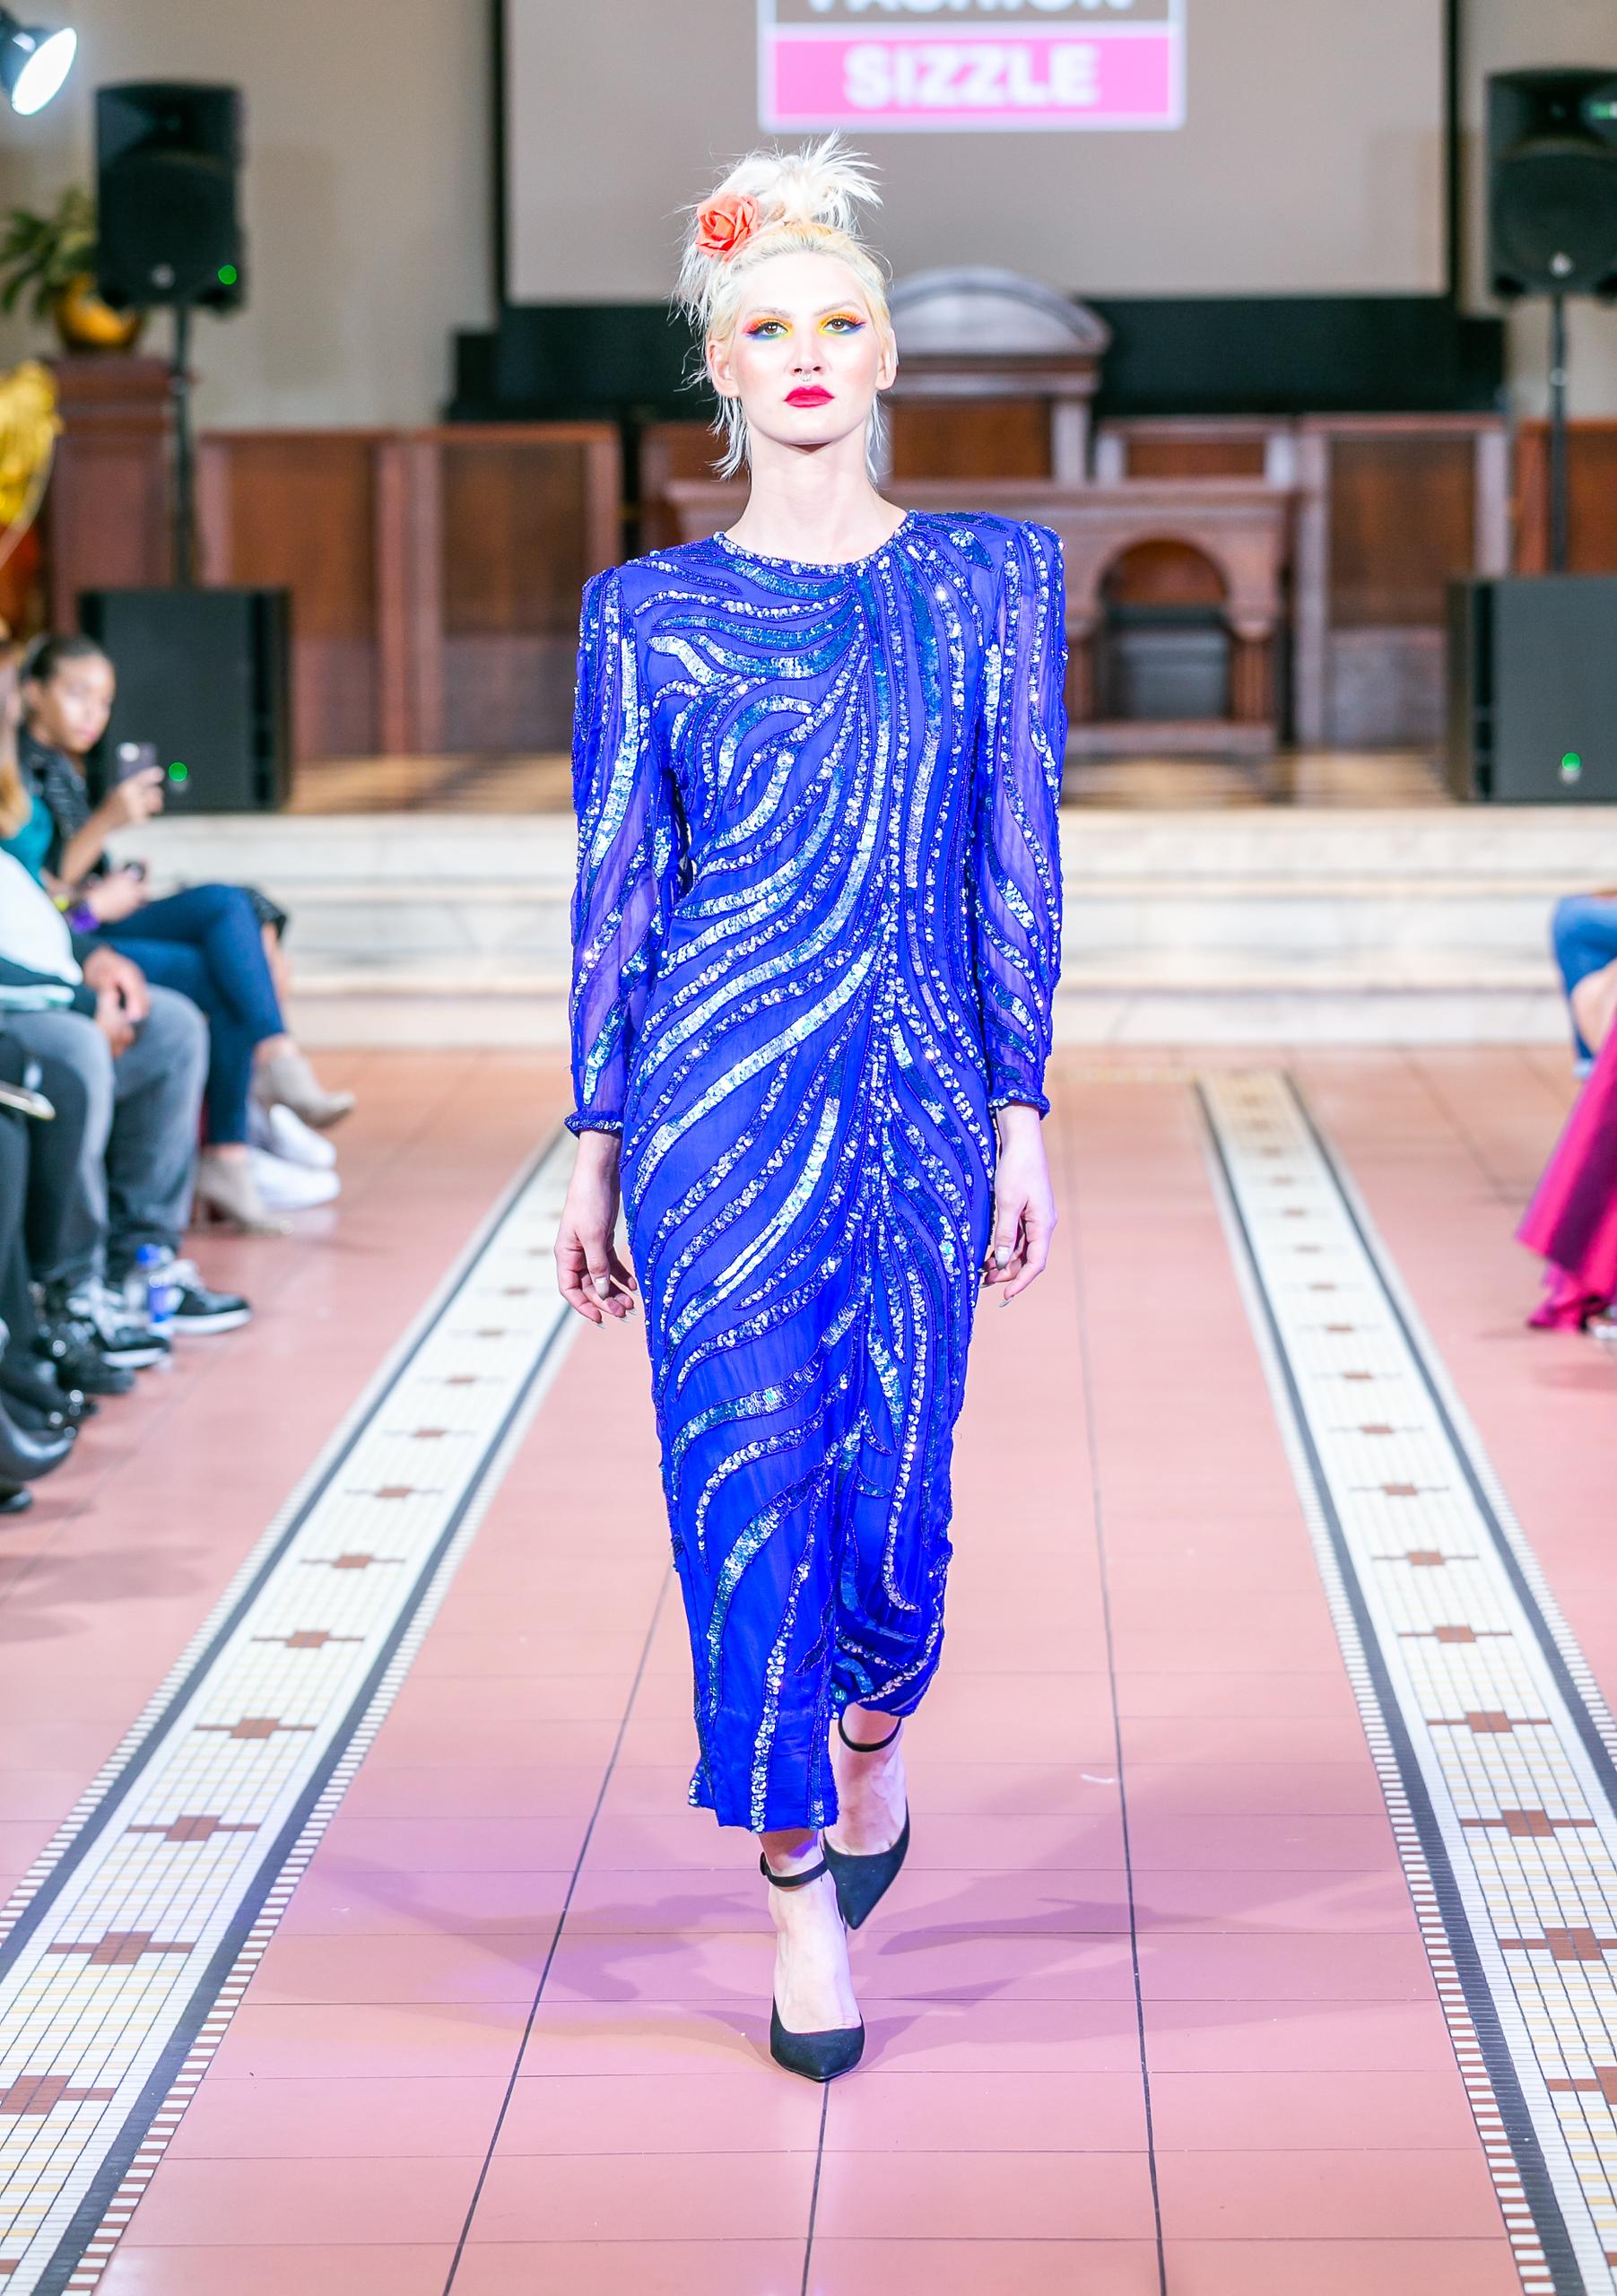 fashion-sizzle-boutique-showcases-beauty-fashion-week-2019